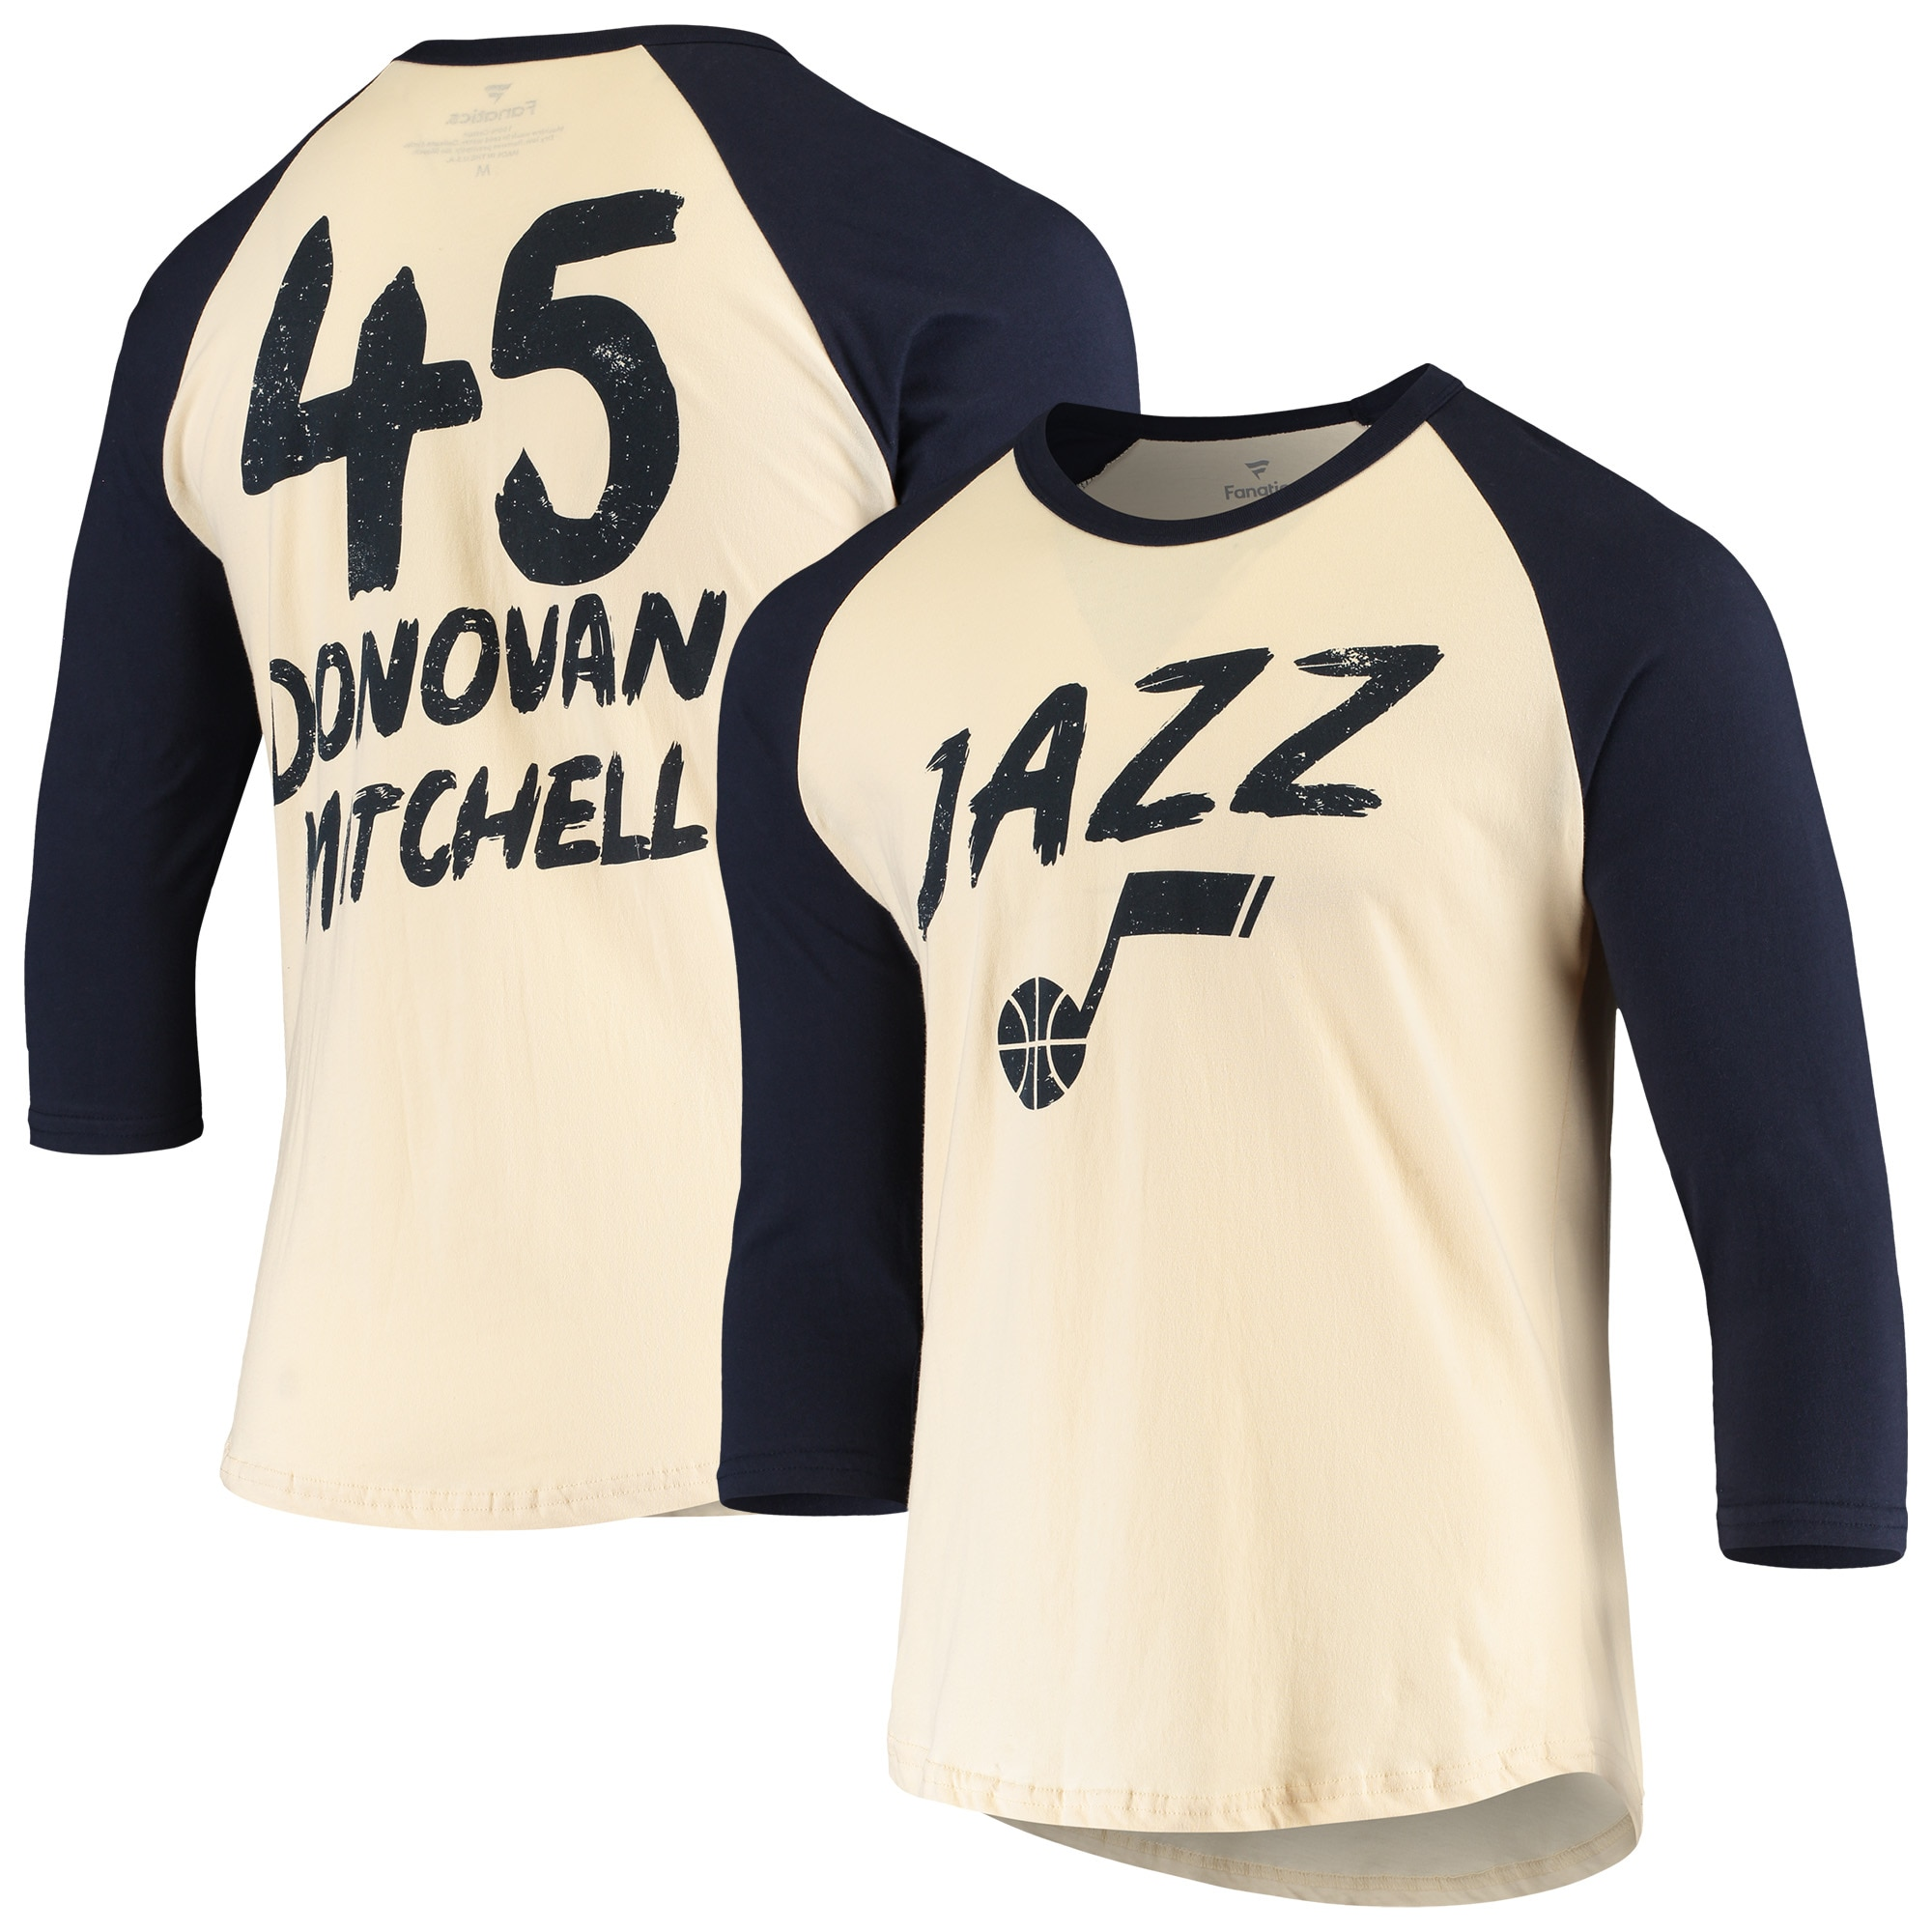 Donovan Mitchell Utah Jazz Fanatics Branded Raglan 3/4 Sleeve T-Shirt - Cream/Navy